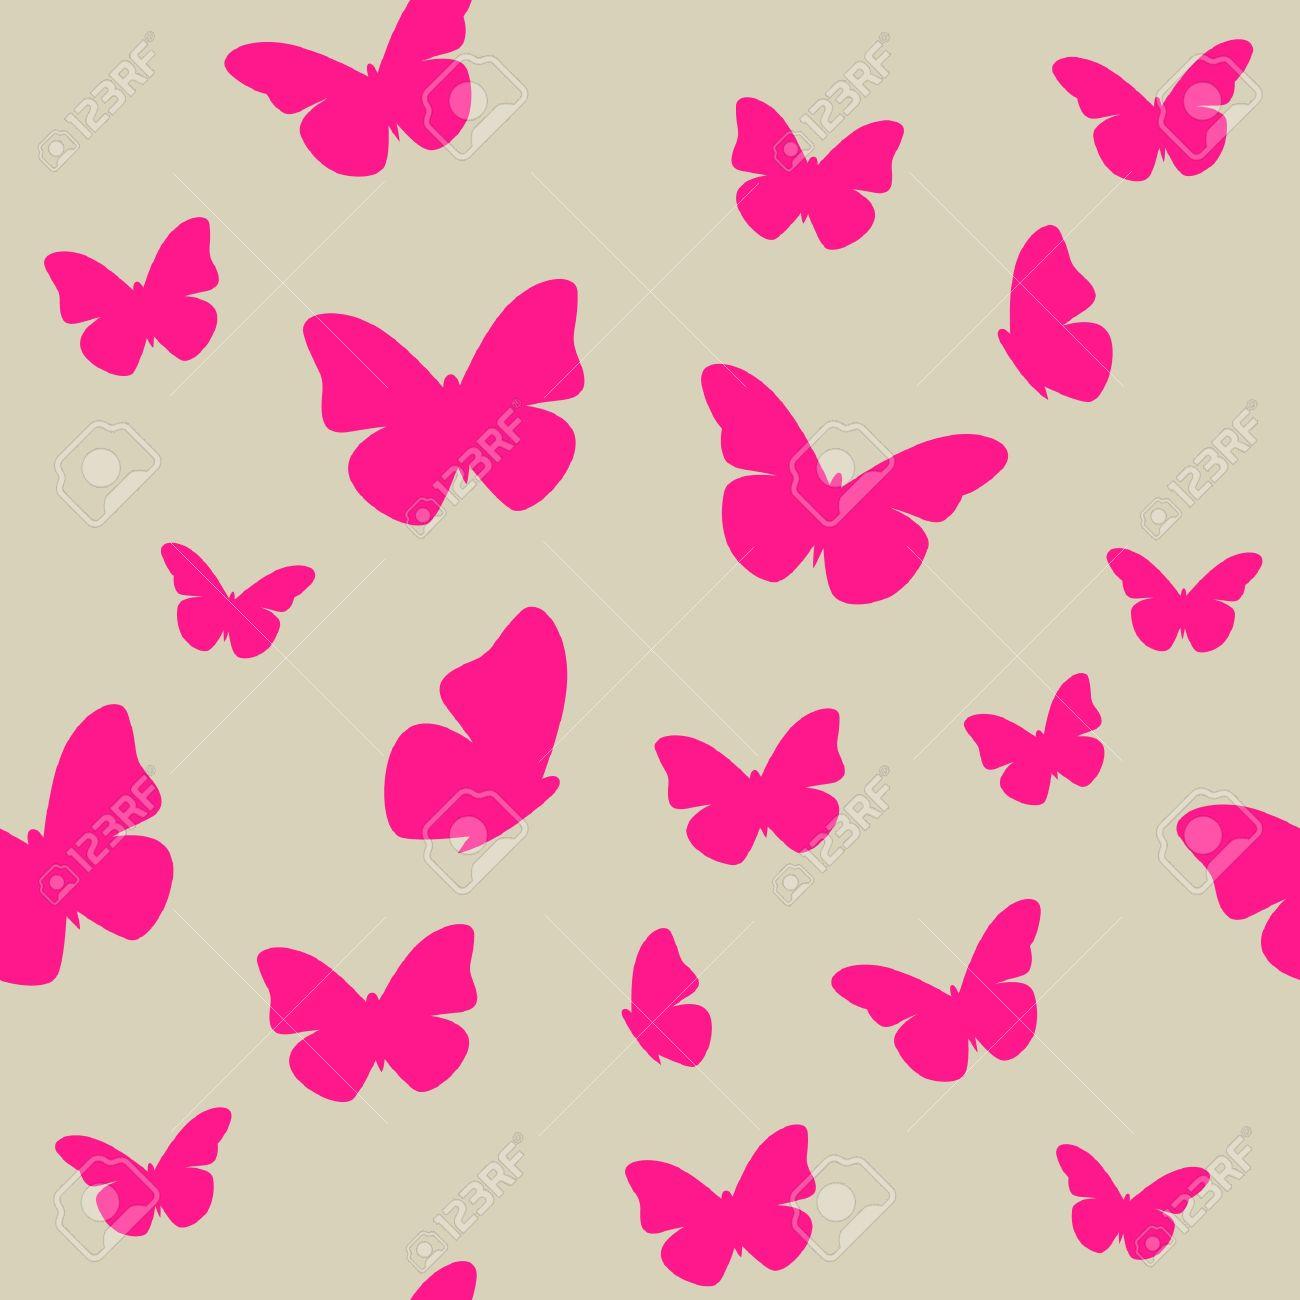 http://previews.123rf.com/images/magnia/magnia1209/magnia120900067/15094332-Papillon-rose-sur-fond-beige-motif-transparente-Banque-d%27images.jpg